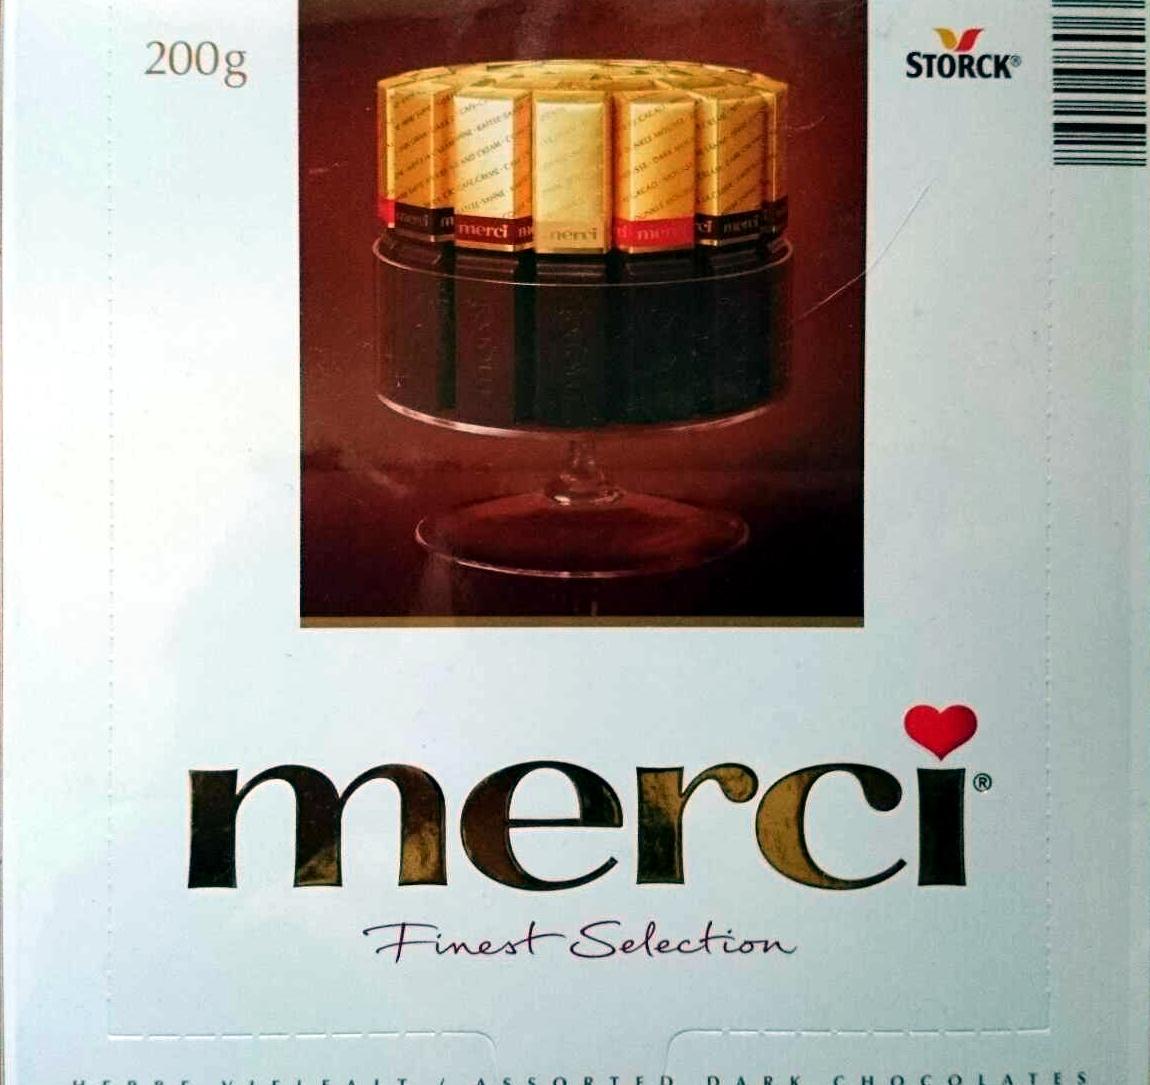 Merci Finest Selection Dark Chocolates - 200g